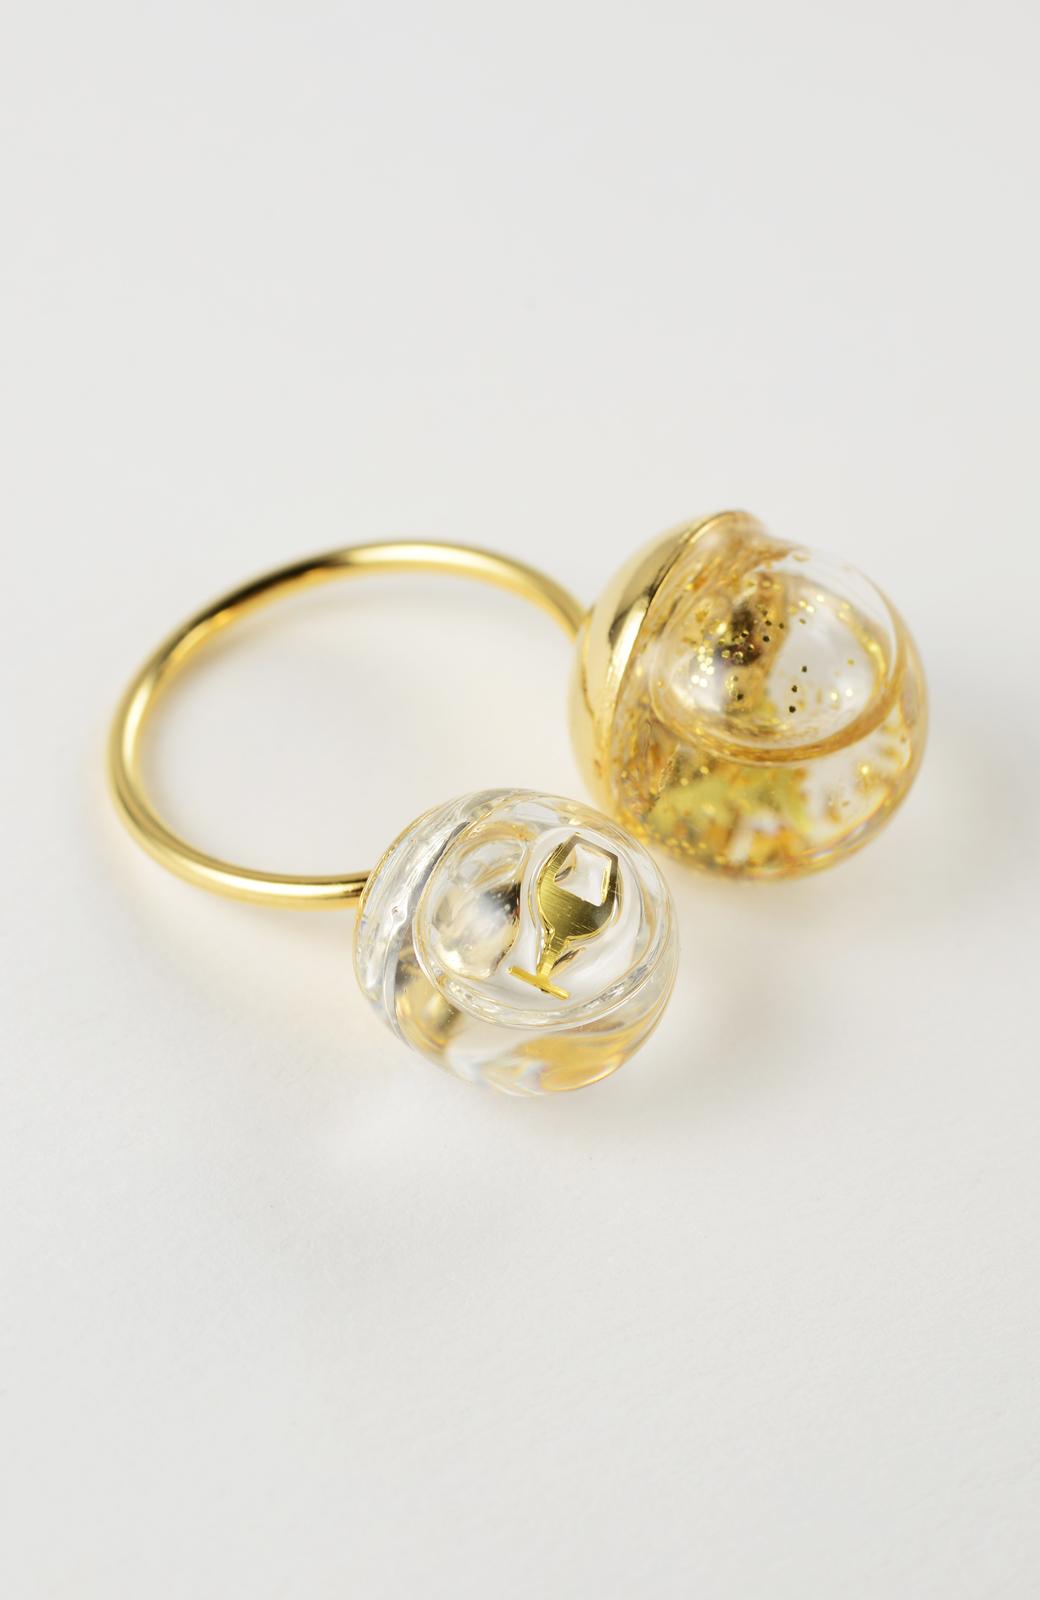 haco! てとひとて KANA MATSUNAMI チャリティー企画 W Glass dome リング <ゴールド>の商品写真5